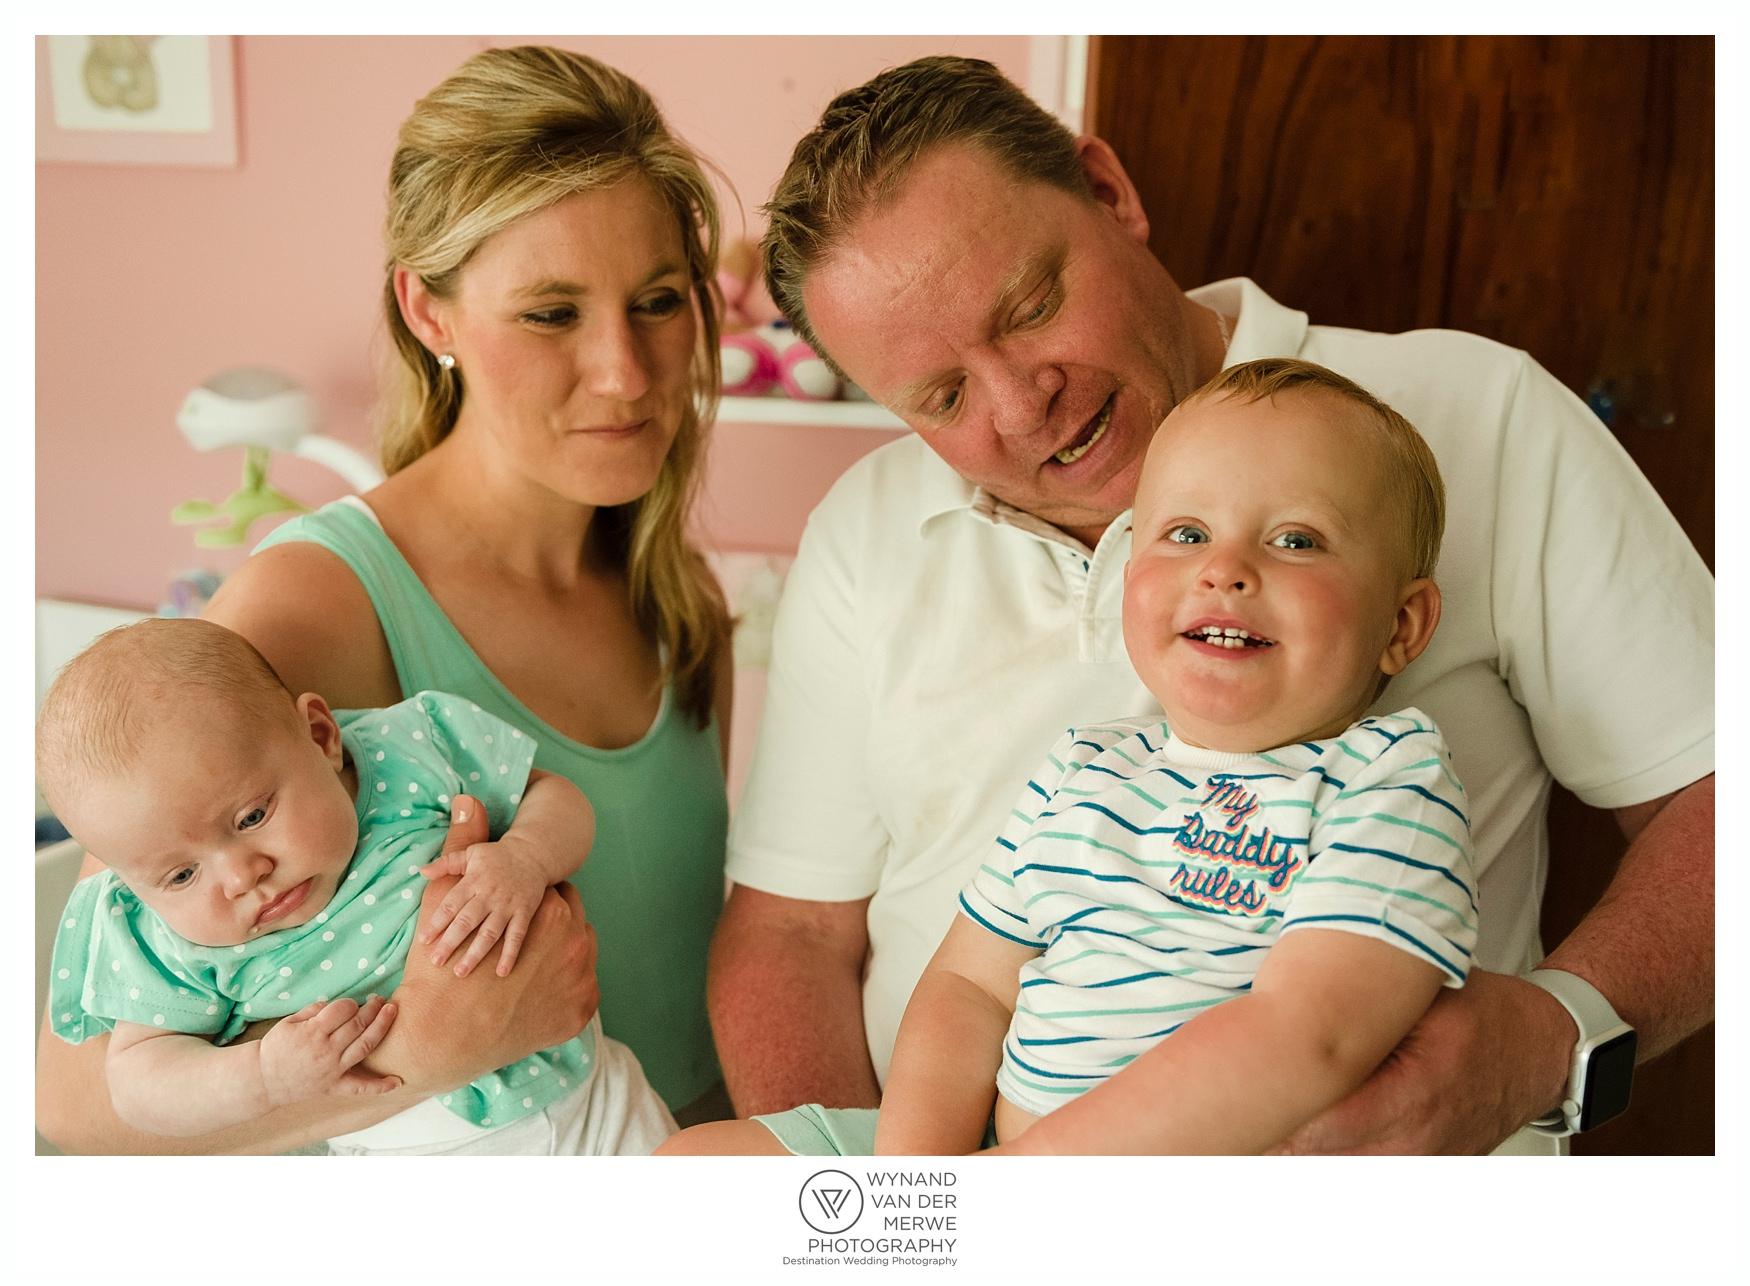 Wynandvandermerwe kirsten robert family lifestyle photography benoni location gauteng-91.jpg